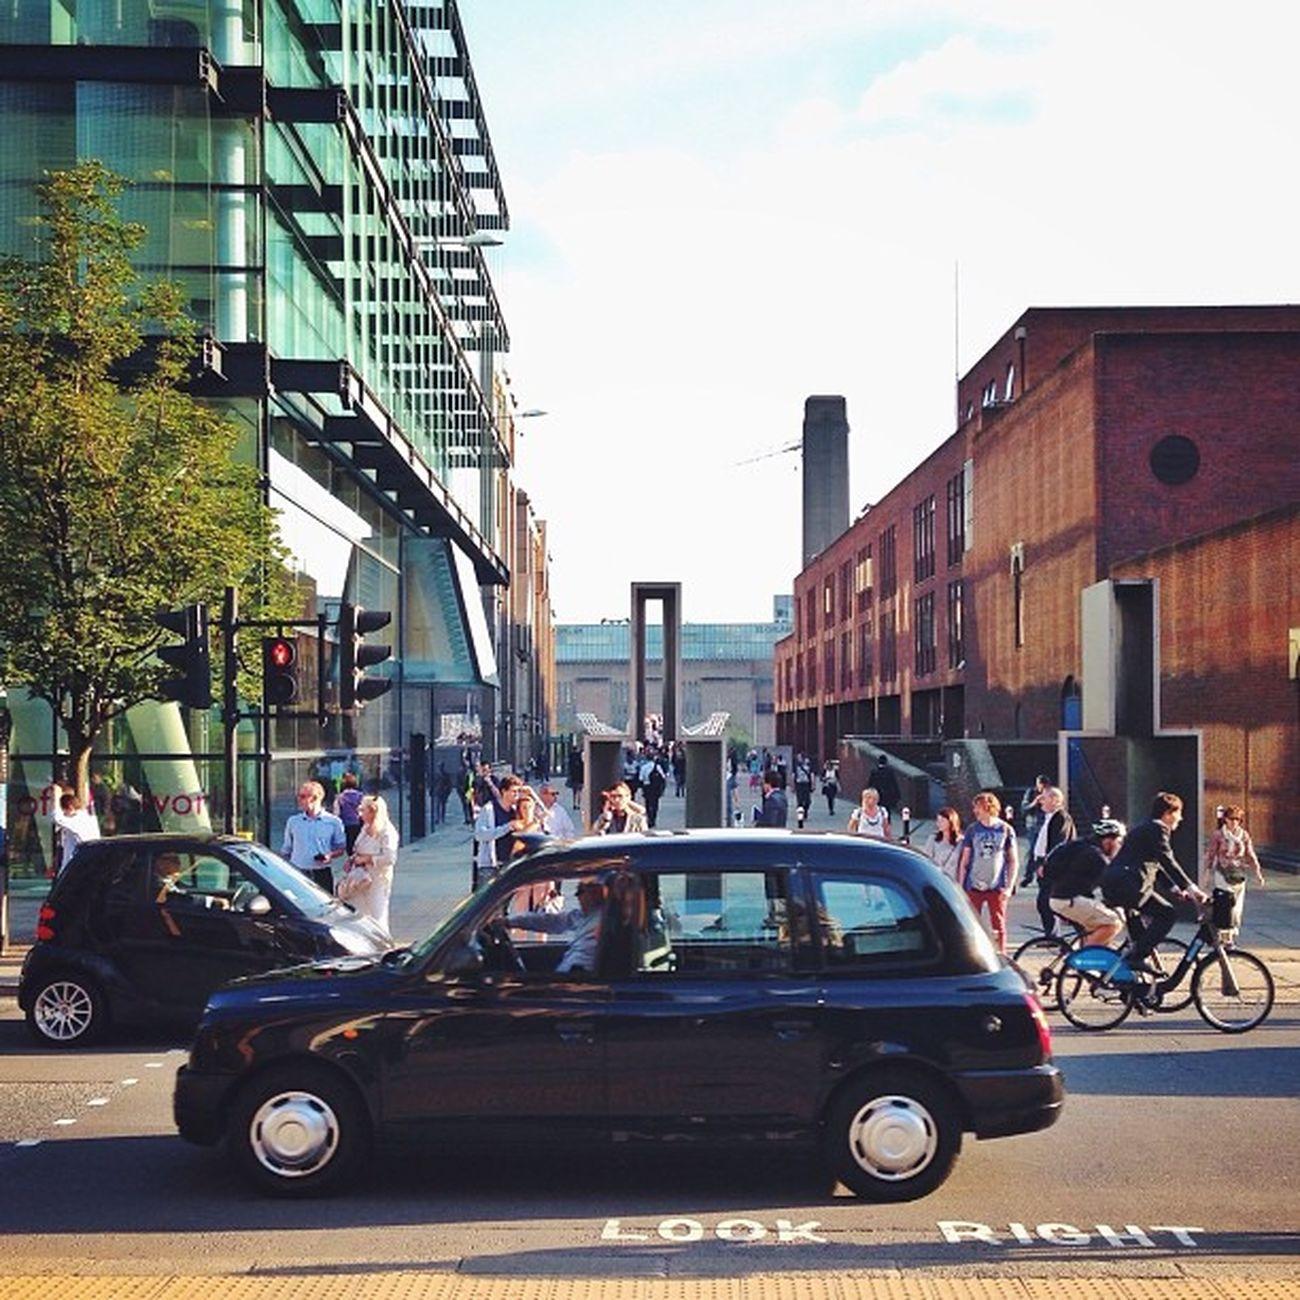 Streets of #London ???☀️????#look_right #alan_in_london #gf_uk #gang_family #igers_london #insta_london #london_only #thisislondon #from_city #ic_cities_london #ig_england #love_london #gi_uk #ig_london #londonpop #allshots_ #aauk #mashpics #pro_shooter Love_london Ic_cities_london Ig_london Aauk London Capture_today Gang_family Loveyoursummer Londonpop Mashpics Allshots_ Top_masters London_only From_city Gf_uk Pro_shooters Alan_in_london Insta_london Thisislondon Look_right Gi_uk Igers_london Ig_england